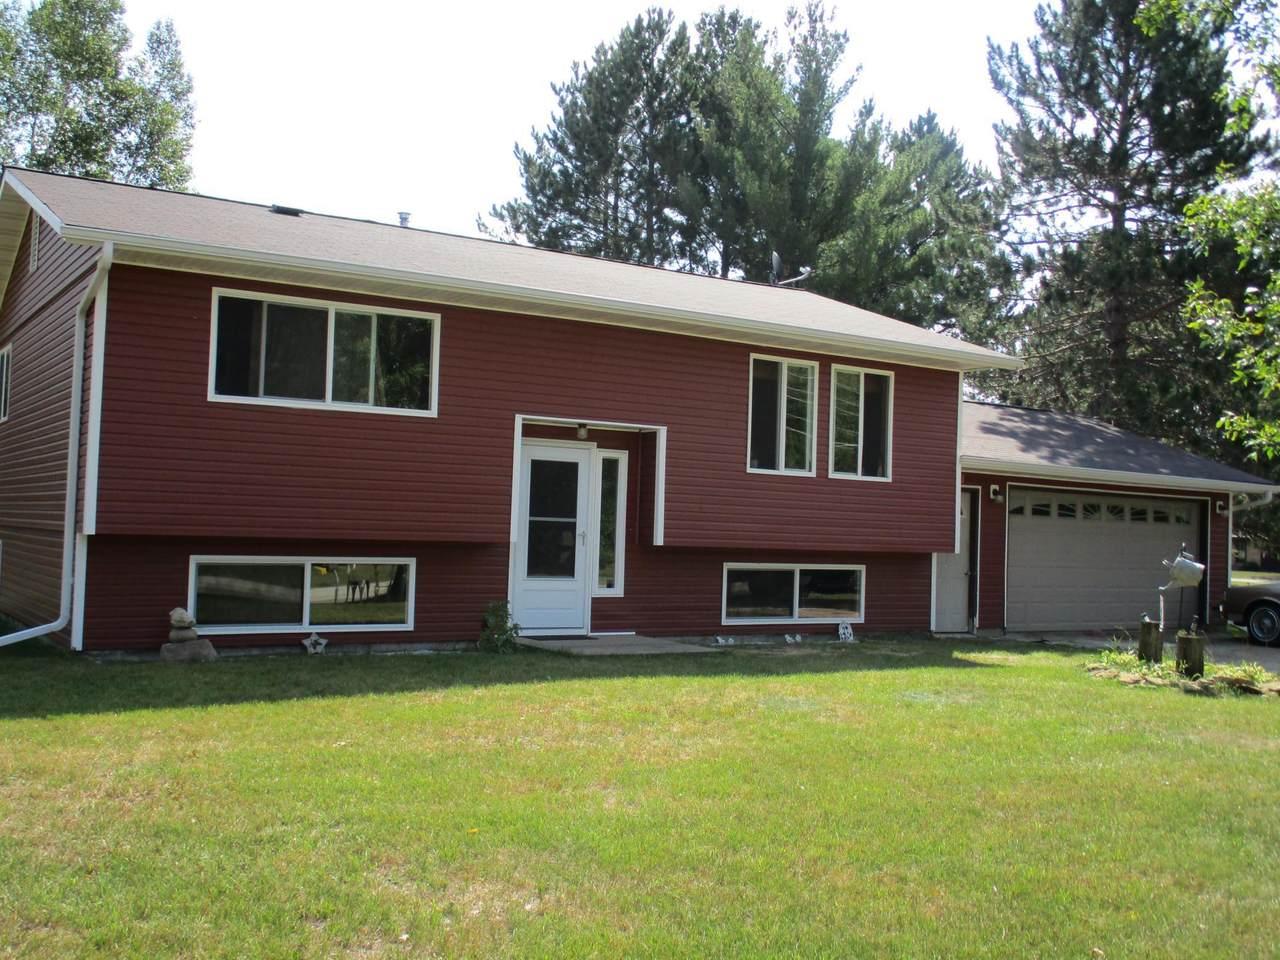 502 La Prairie Ave - Photo 1